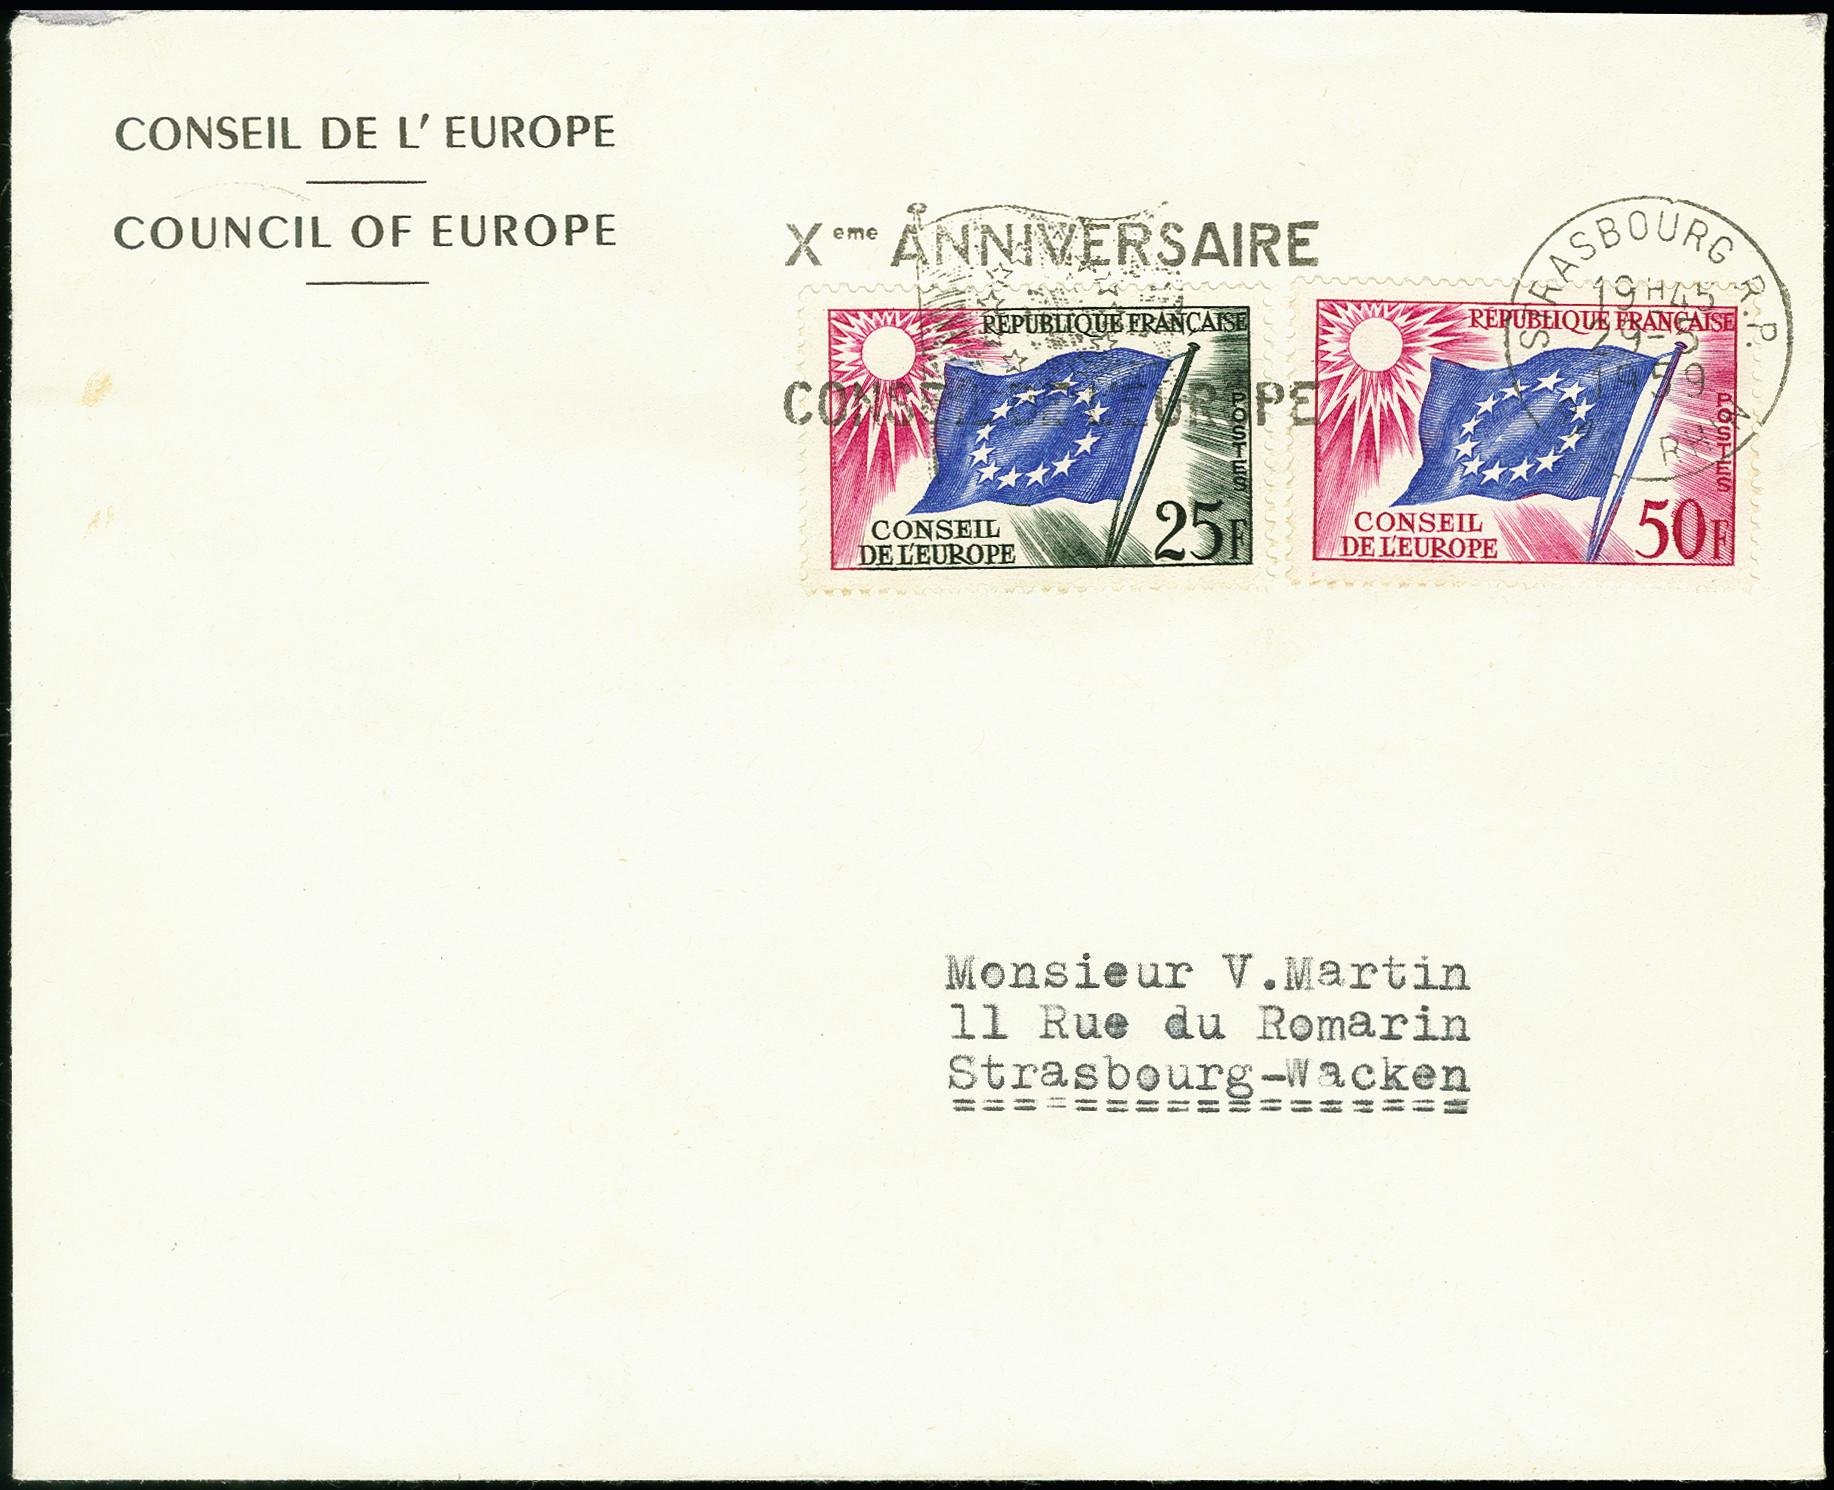 Lot 1335 - frankreich France - officials for the European Council -  Heinrich Koehler Auktionen 375rd Heinrich Köhler auction - Day 1